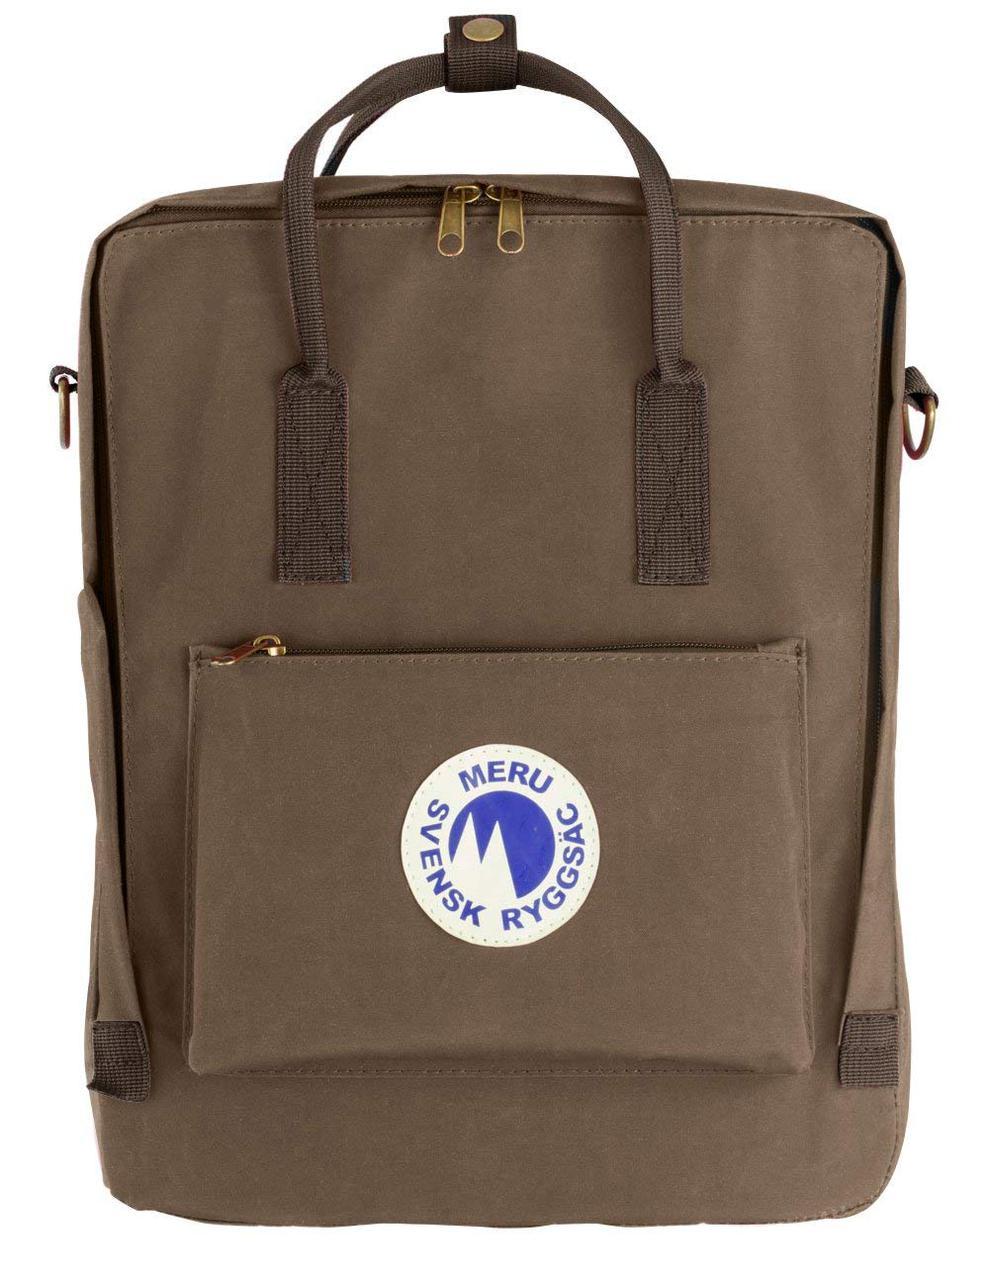 Рюкзак Meru Swedish Backpack (Svensk Ryggsac)  Waterproof (Brown)